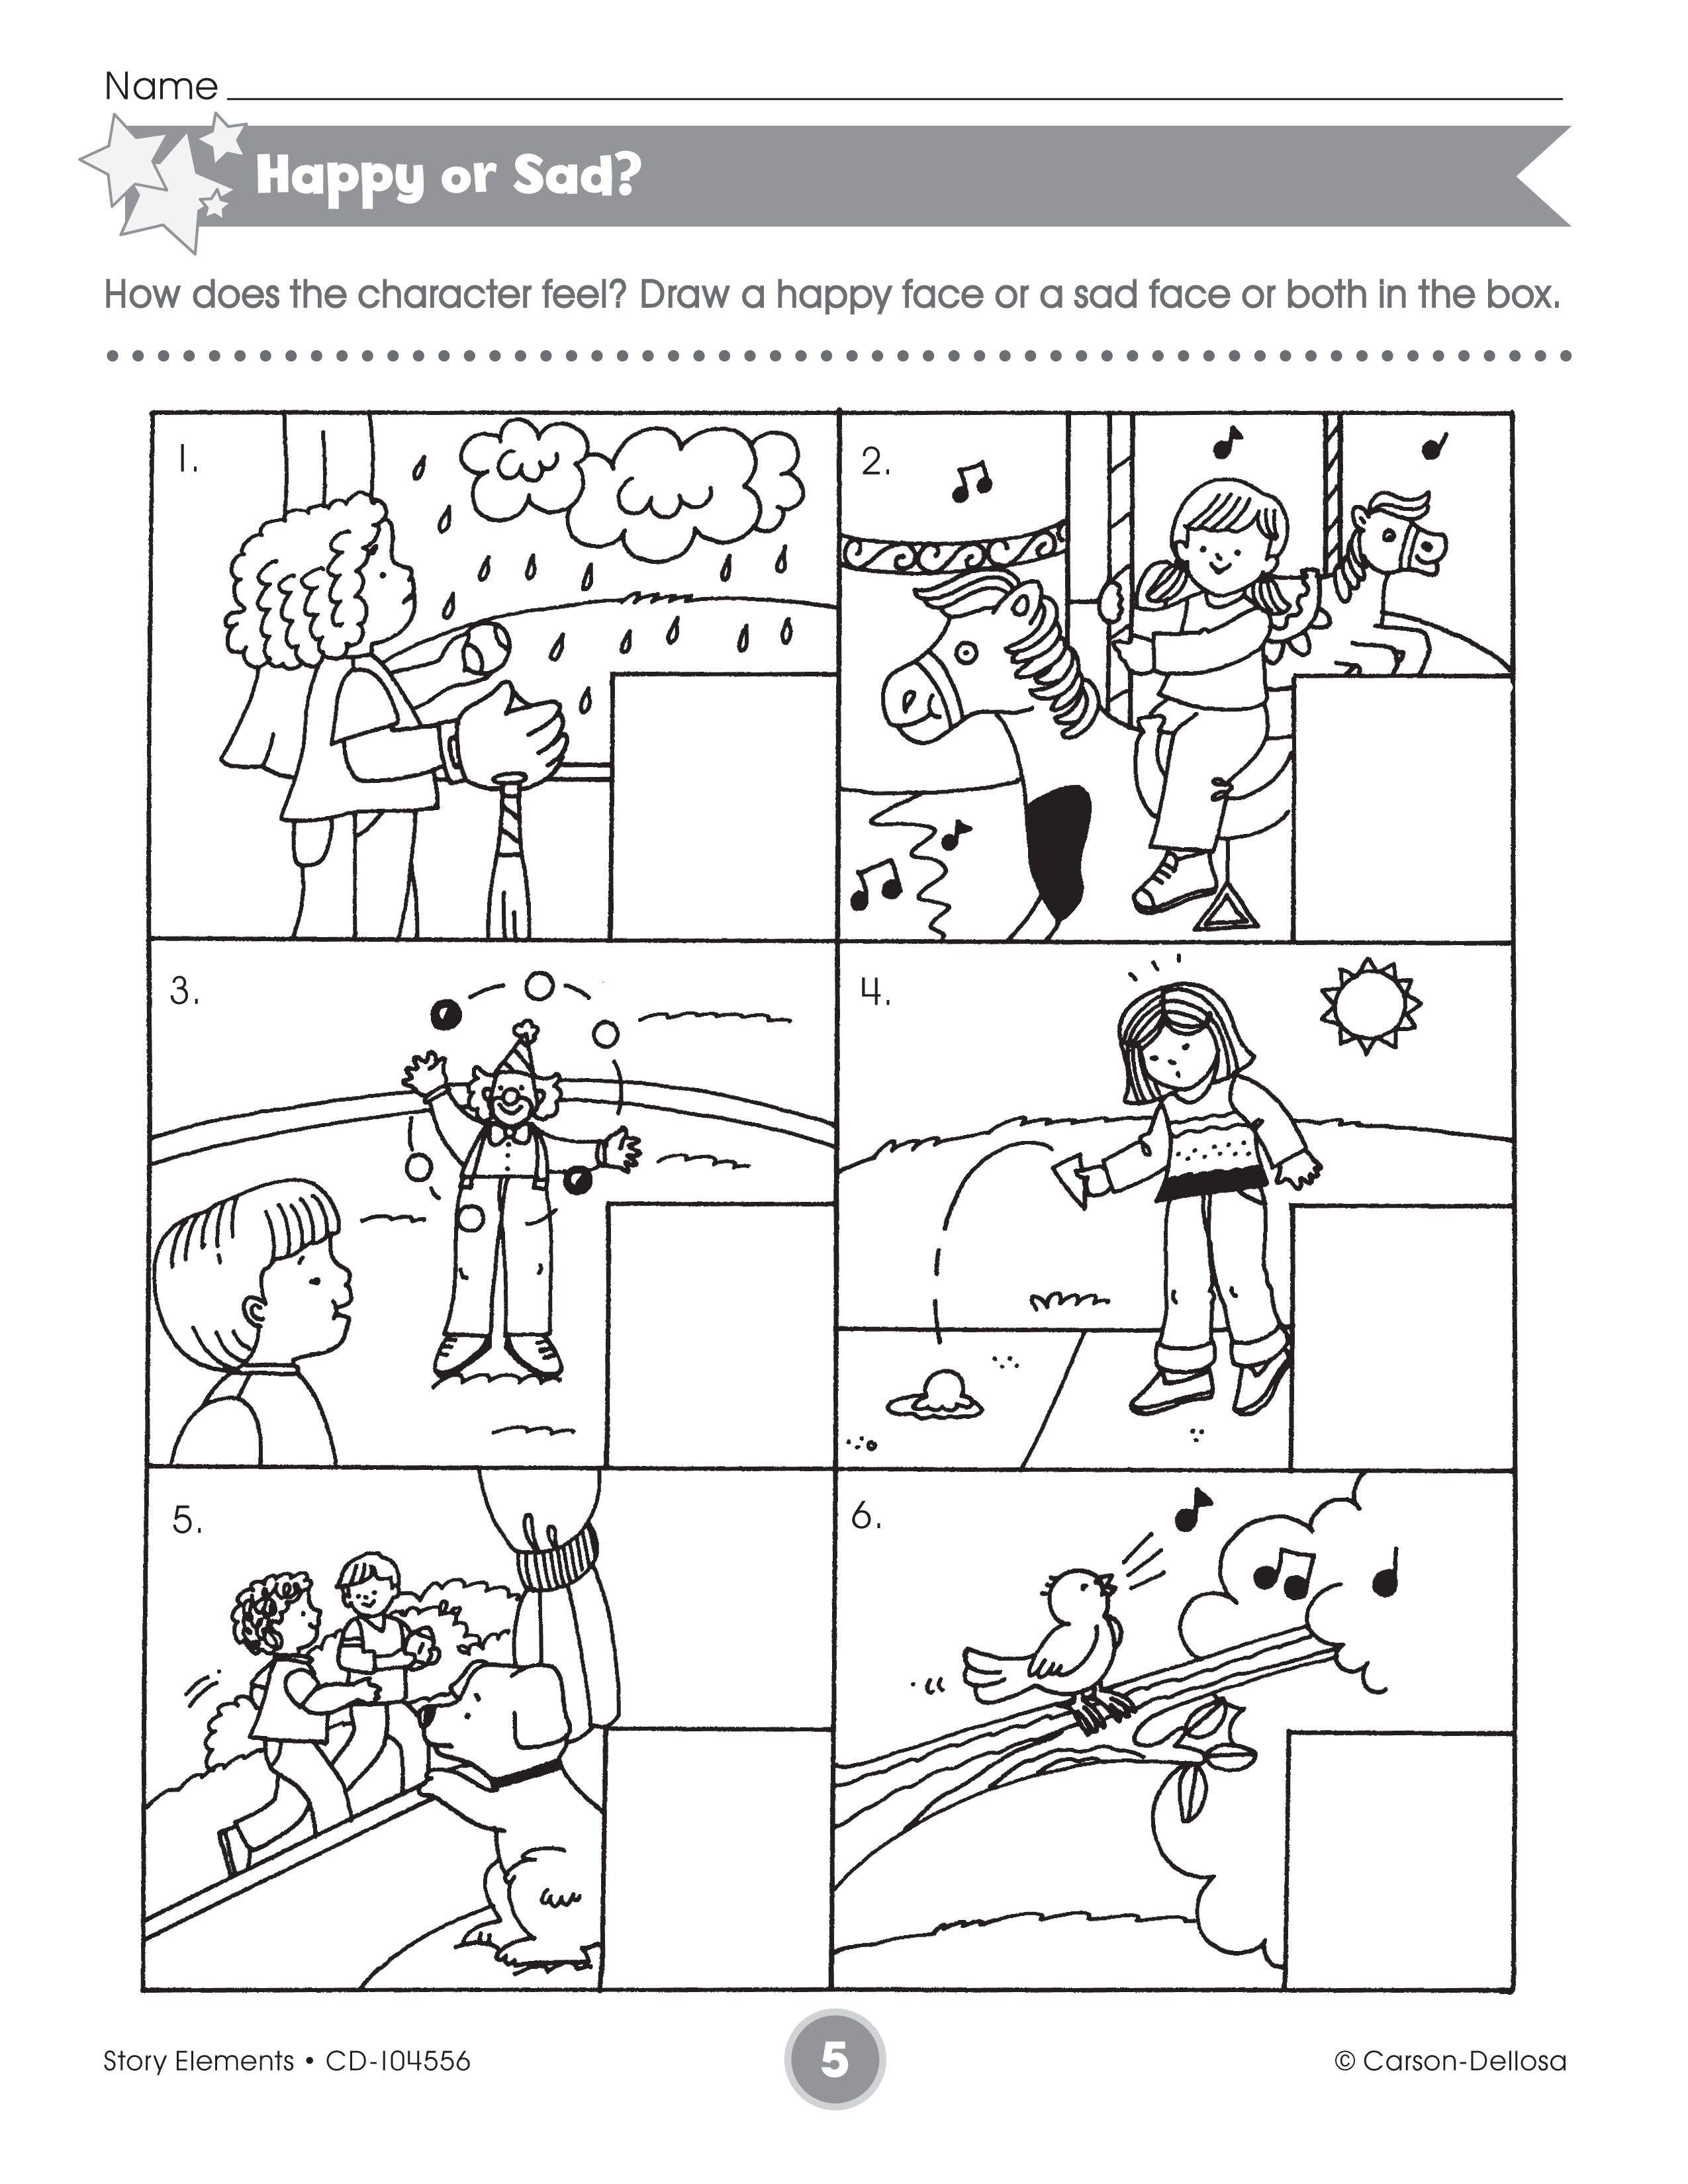 The Happy Or Sad Activity Sheet Helps Student Discern Scenarios